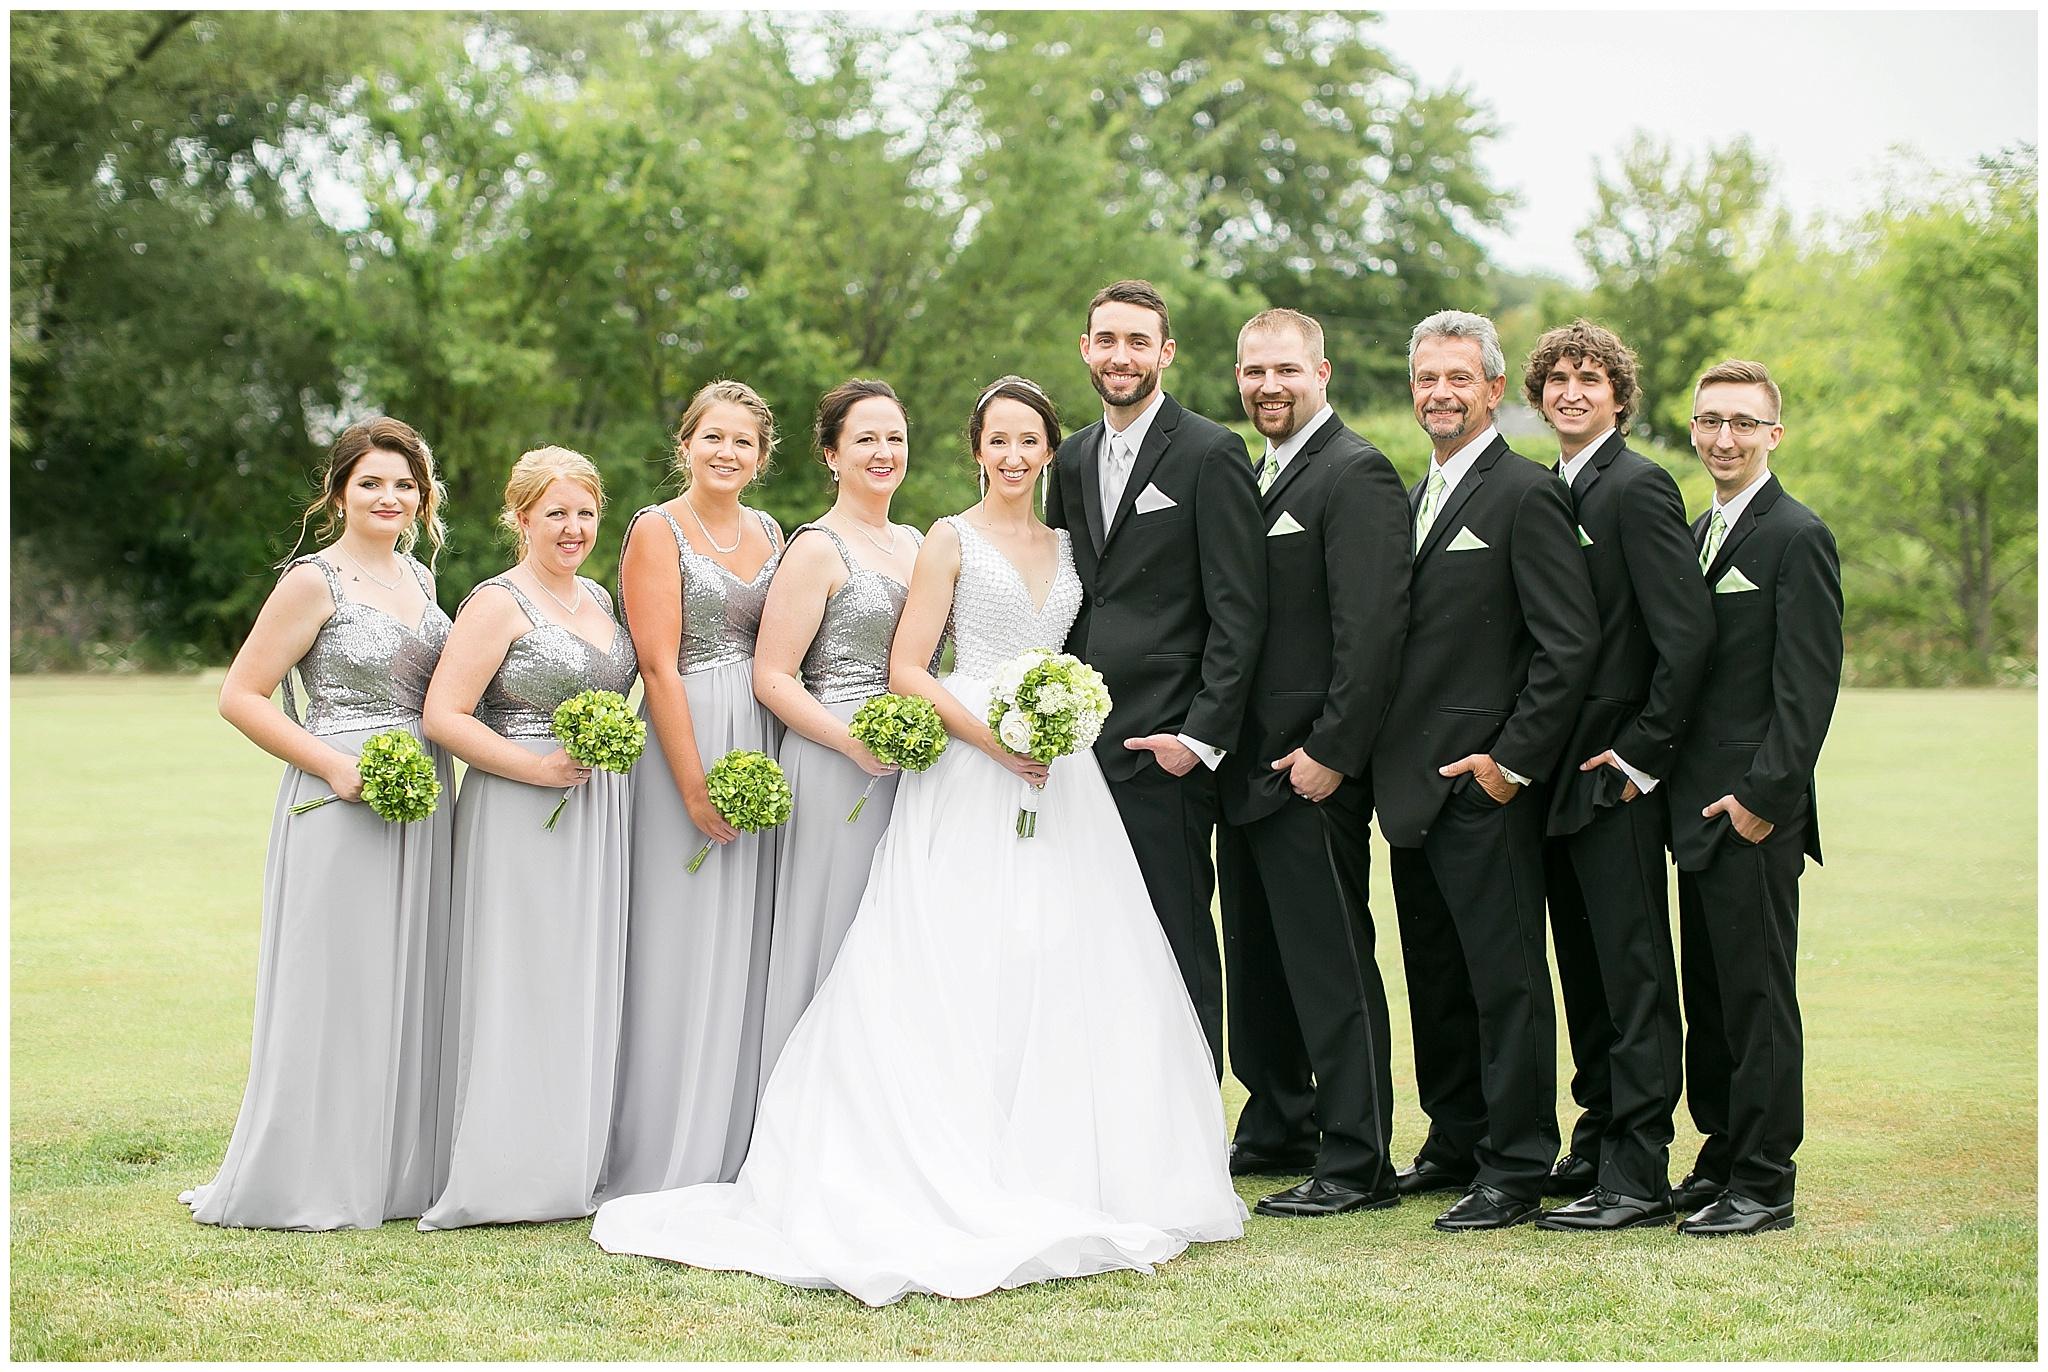 bridgewood_resort_wedding_neenah_wisconsin_0316.jpg